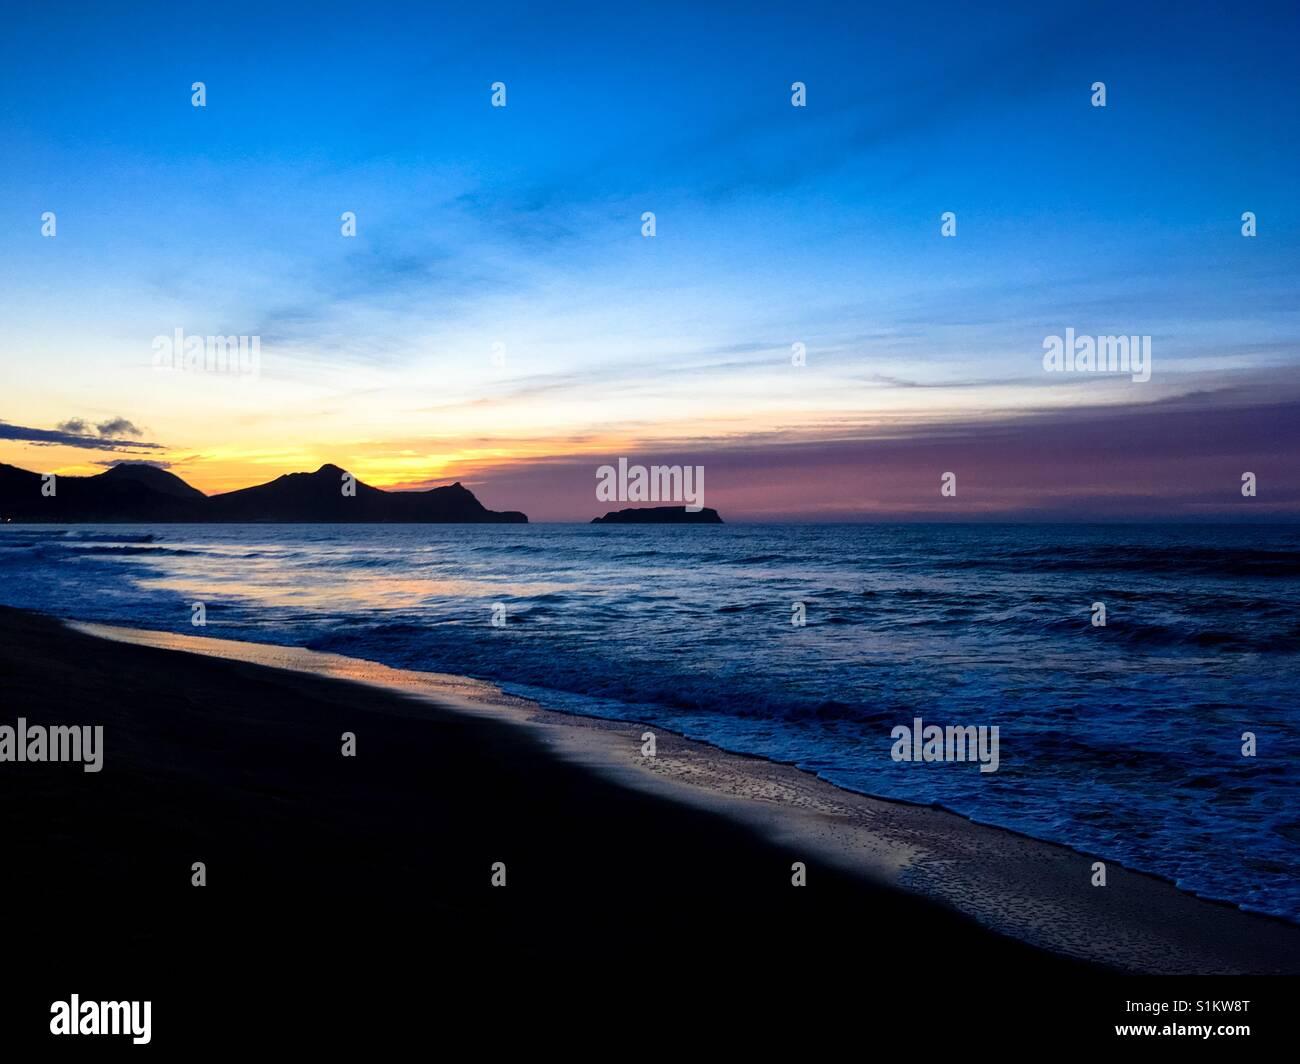 Sunrise over the mountains of Porto Santo, Madeira, Portugal - Stock Image